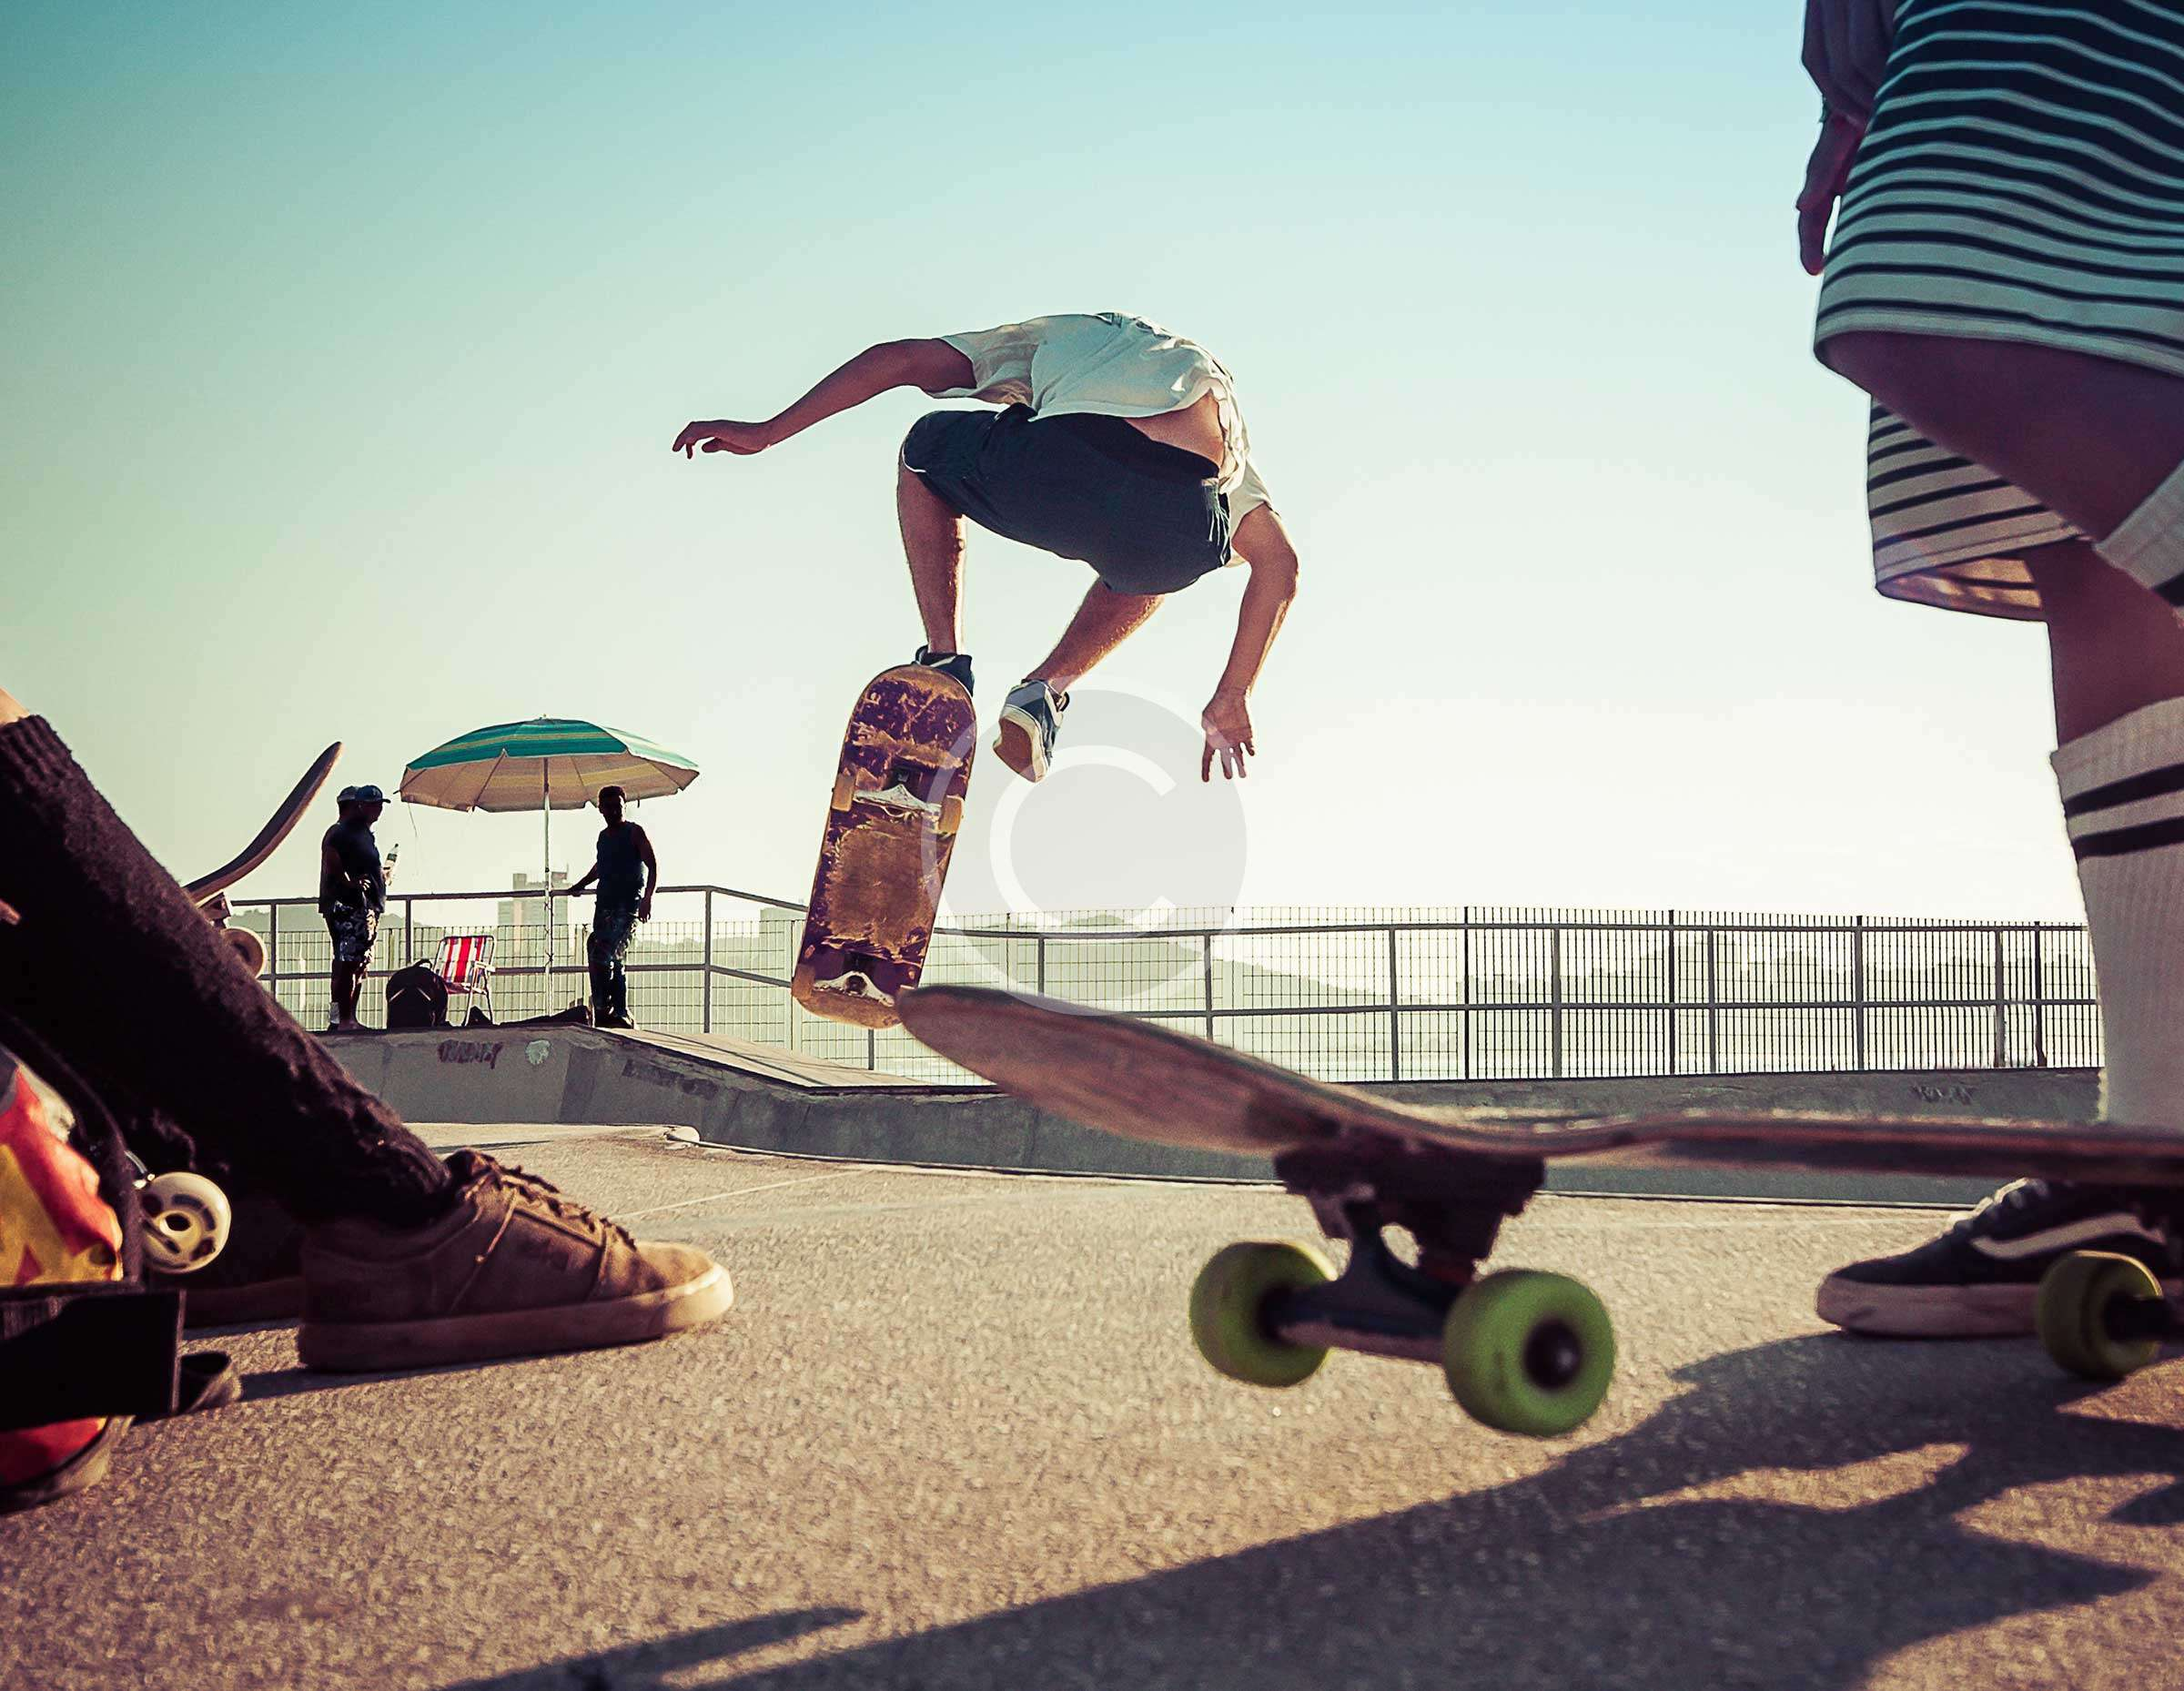 Signature Moves, Tricks and Crazy Stunts